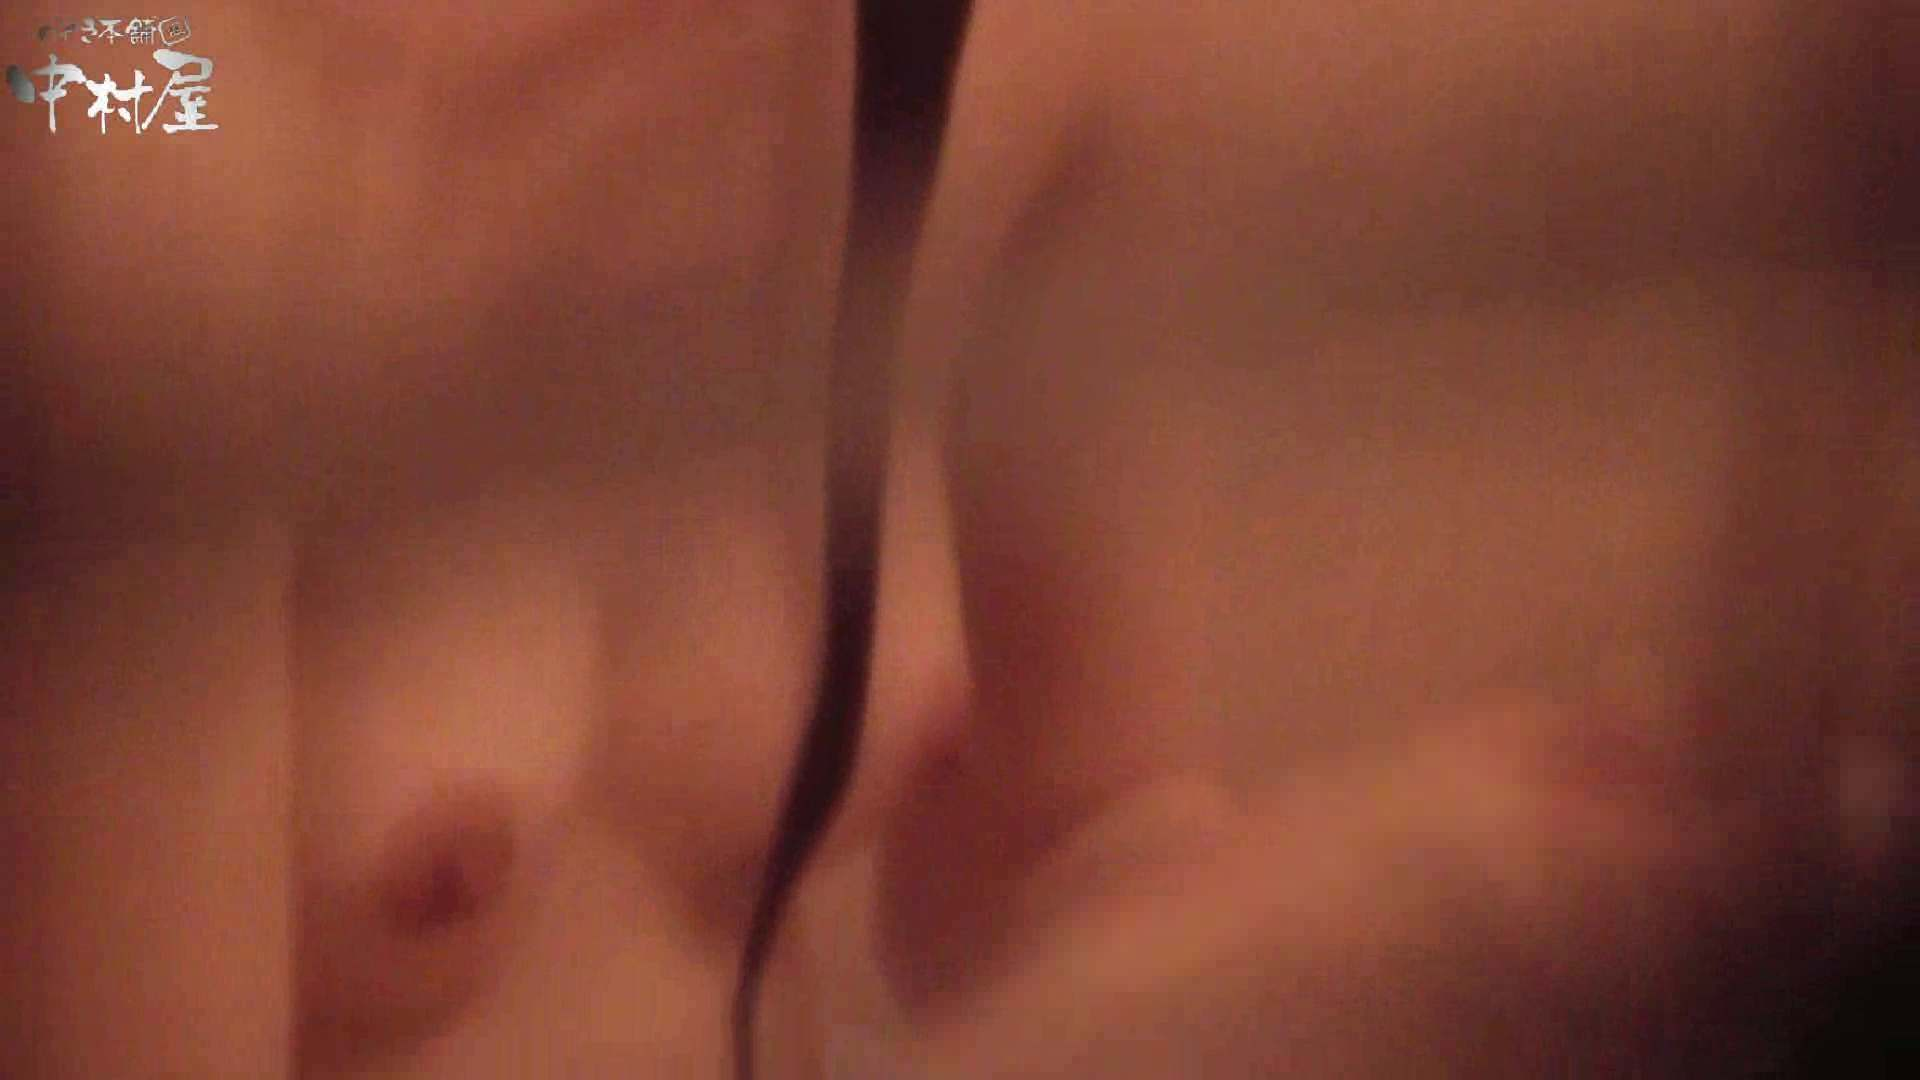 民家風呂専門盗撮師の超危険映像 vol.012 美少女のエロ生活  73連発 48